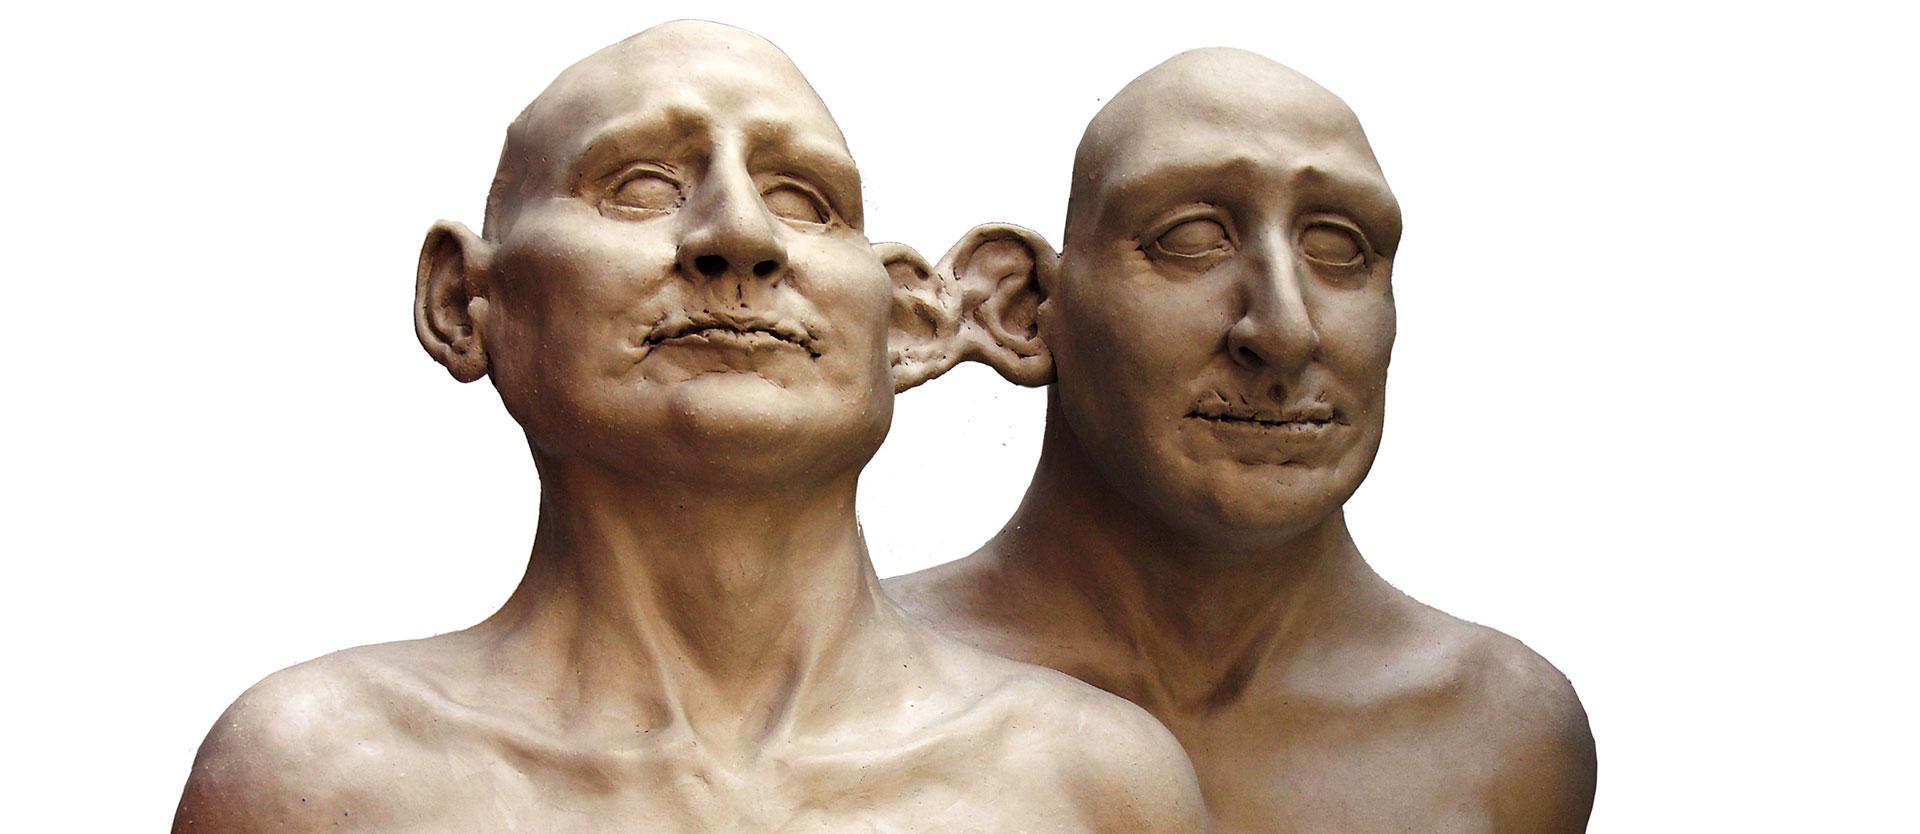 Bustes Jumeau par Gunther Roeder